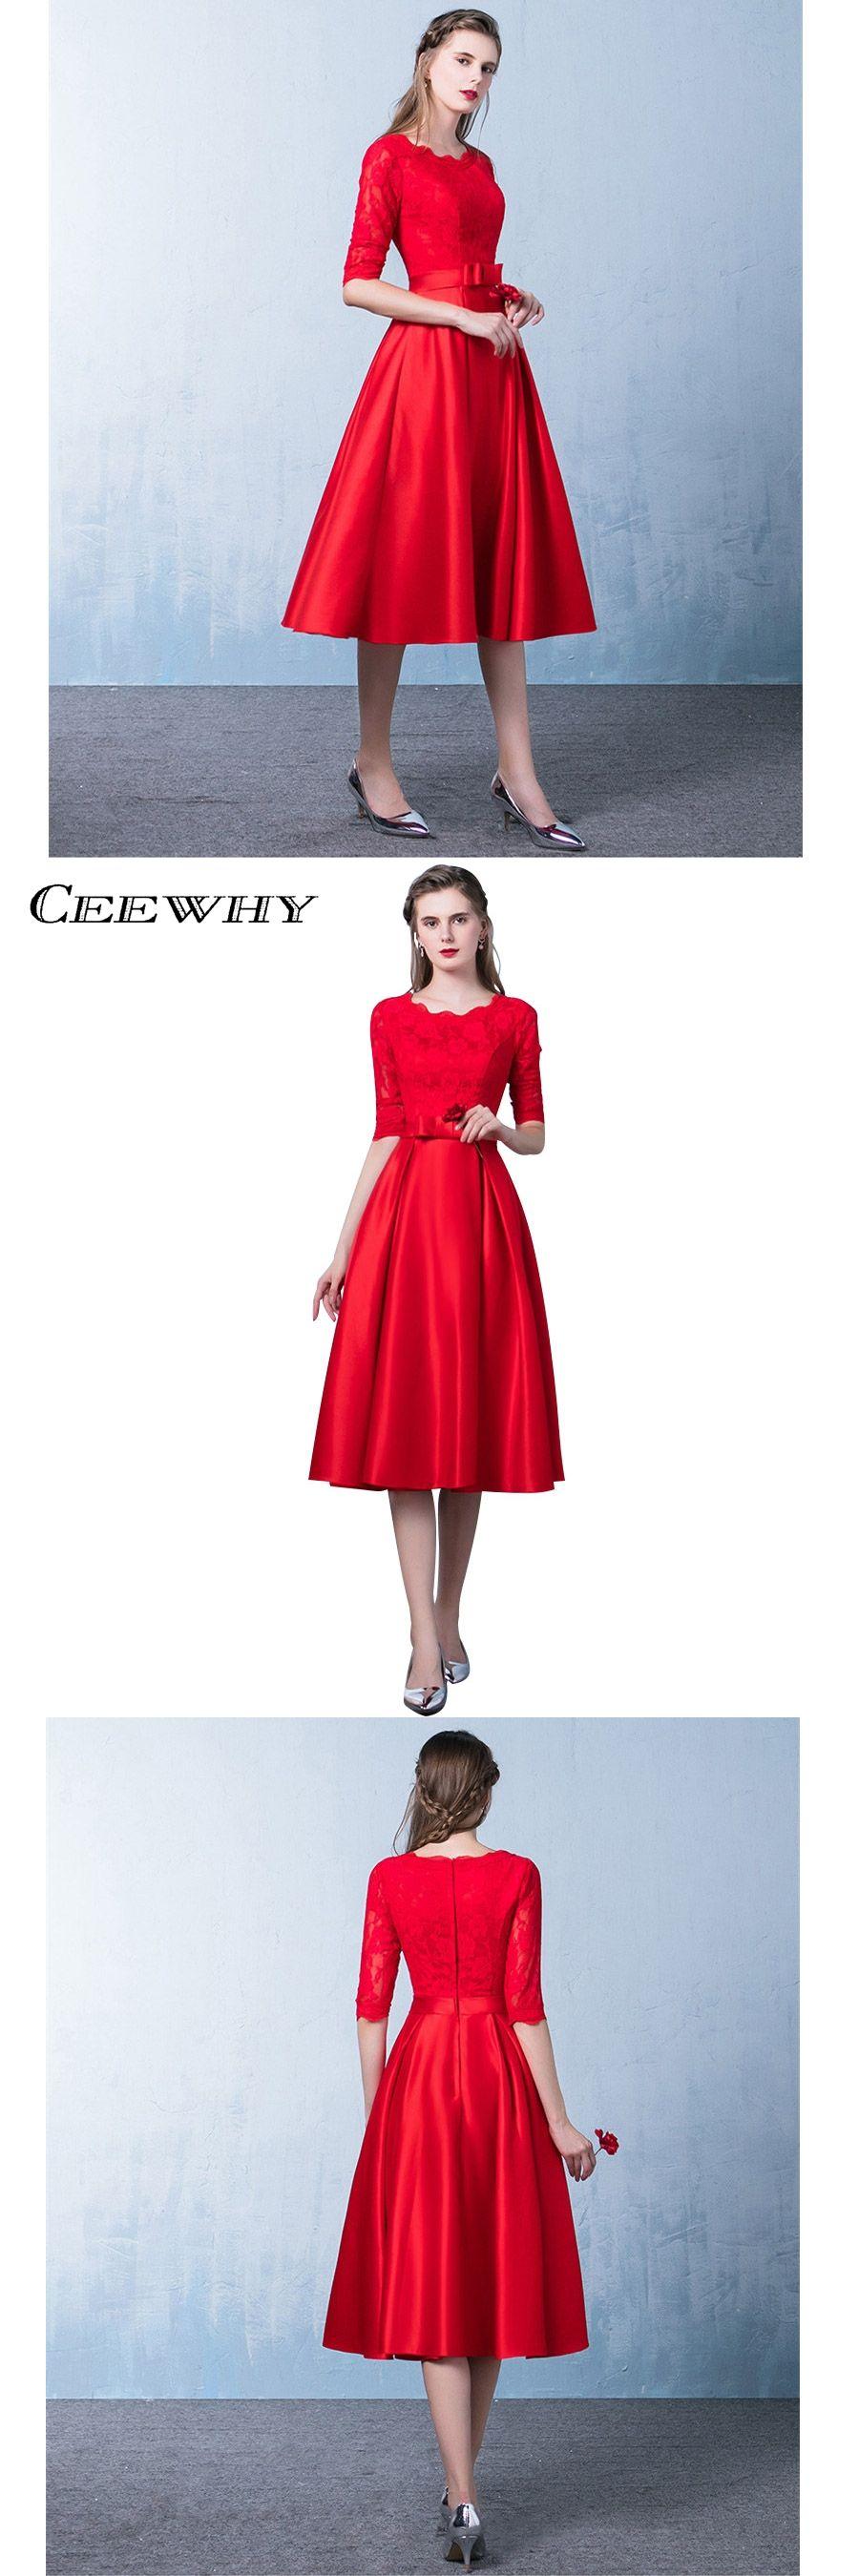 CEEWHY Elegant O-Neck Tea-length Lace Evening Dress Half Sleeve Prom Dresses  Robe f1a48964e5b1